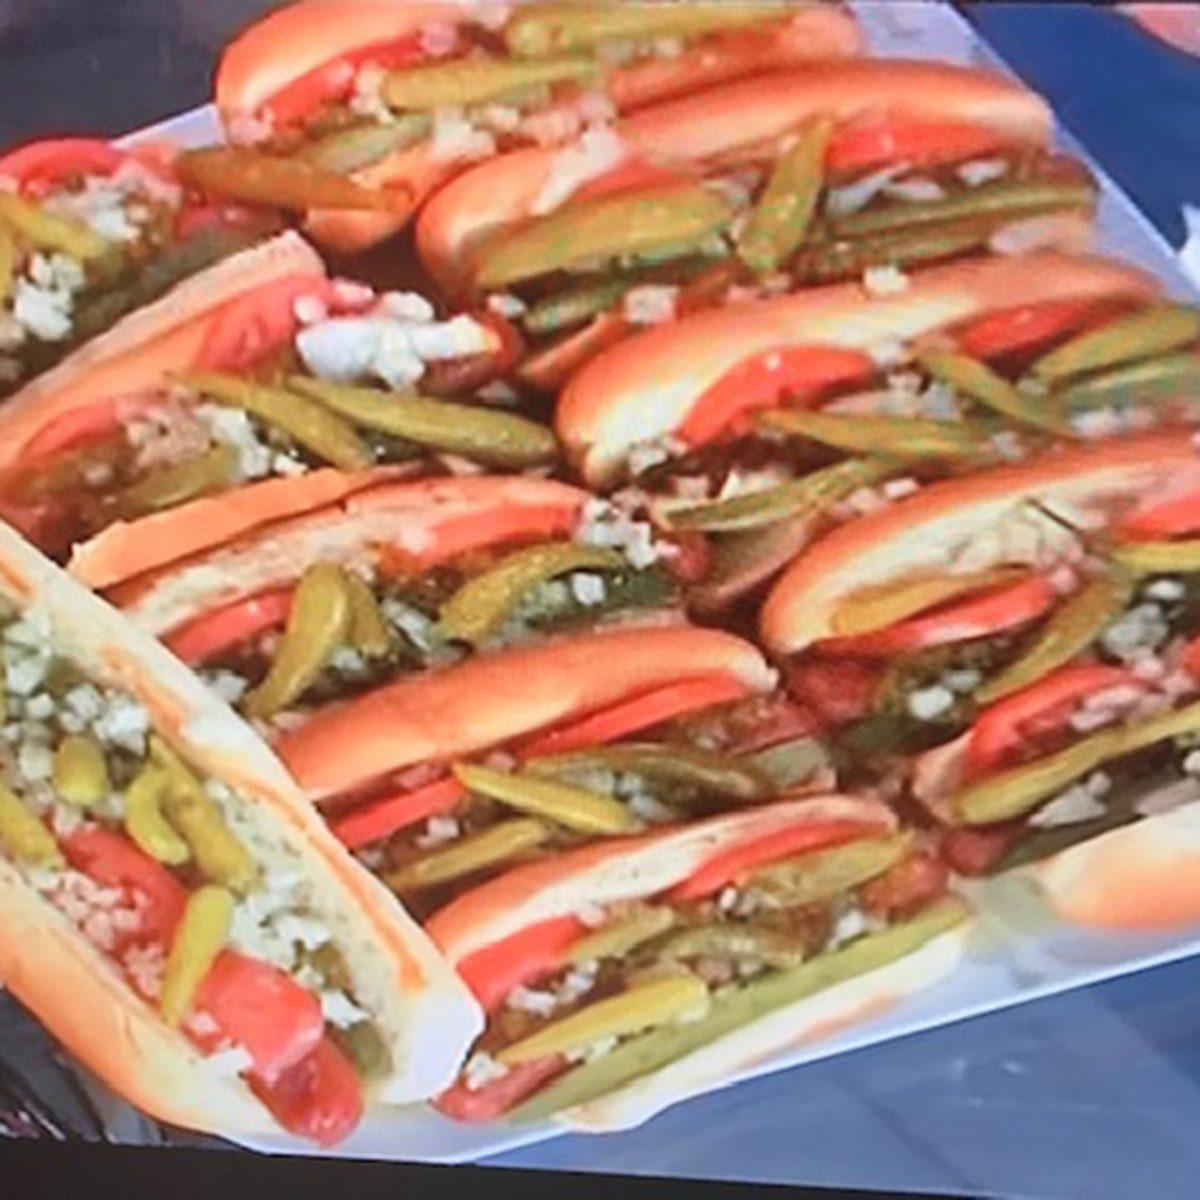 Johnnie's Dog House hotdogs